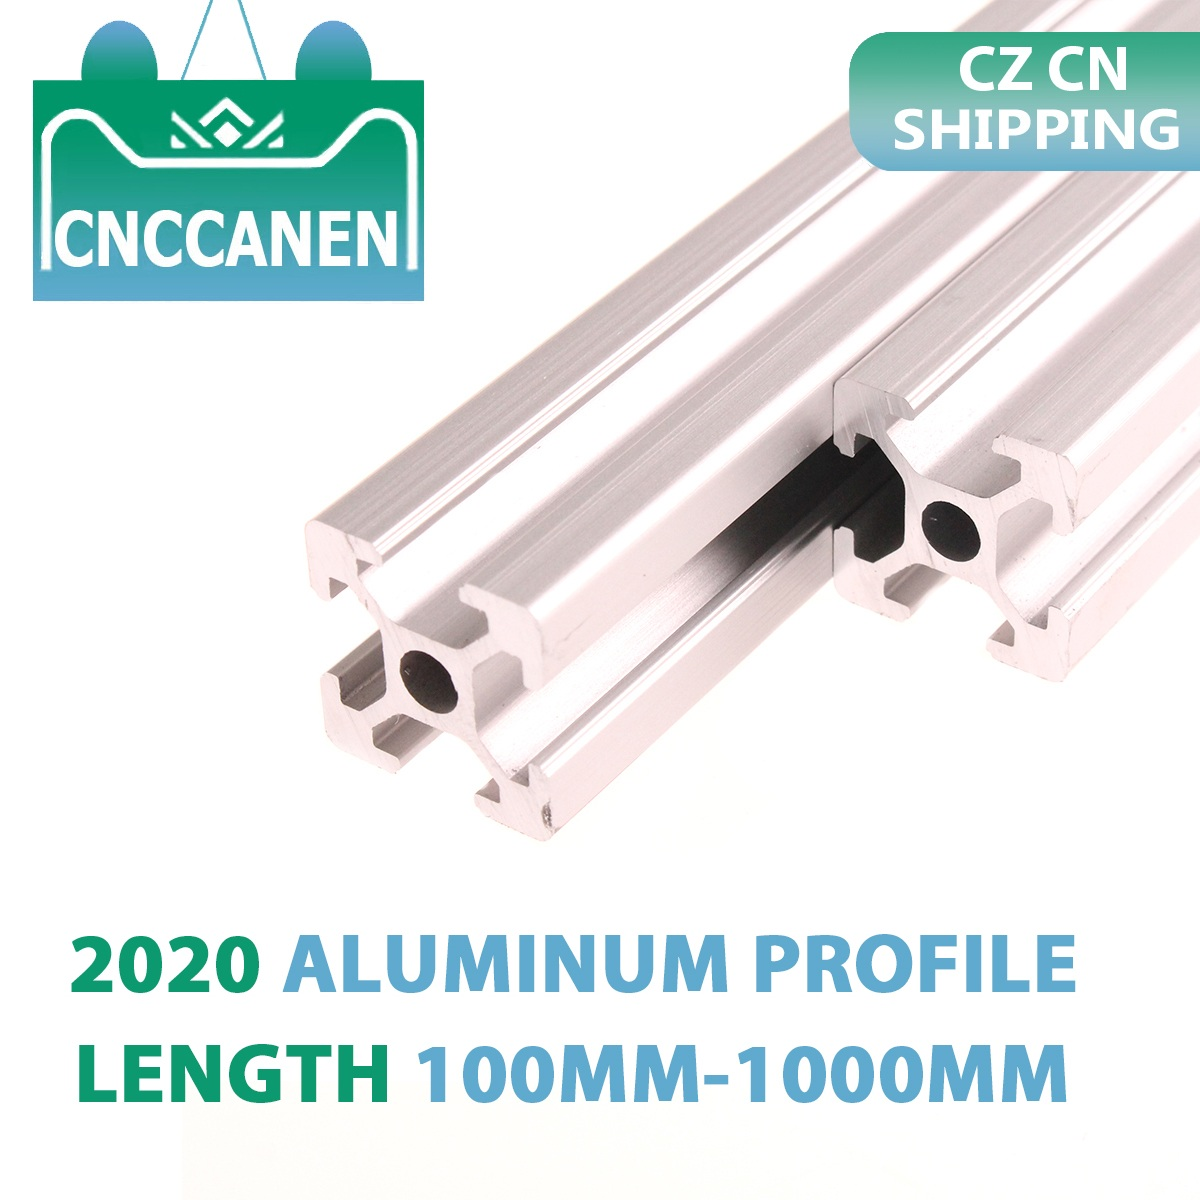 CZ CN Shipping 2PCS 2020 Aluminum Profile Extrusion 100mm-1000mm Length European Standard Anodized For CNC 3D Printer Parts DIY